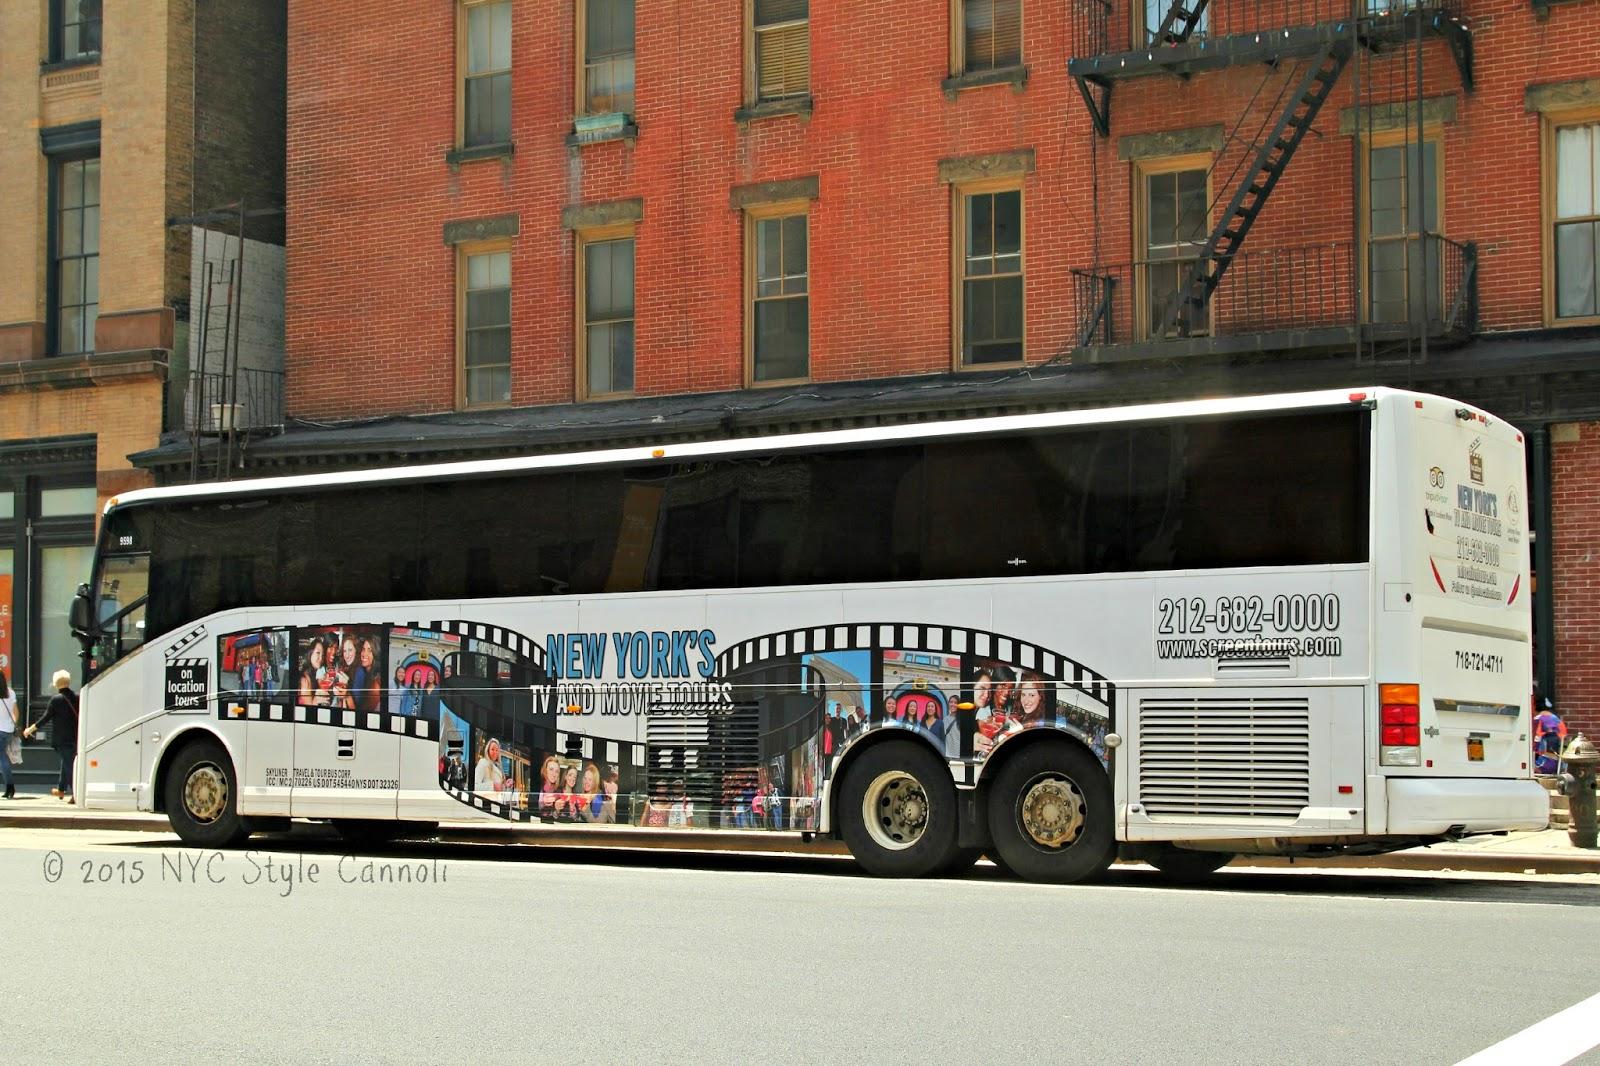 Sex and the city bus tour Nude Photos 32